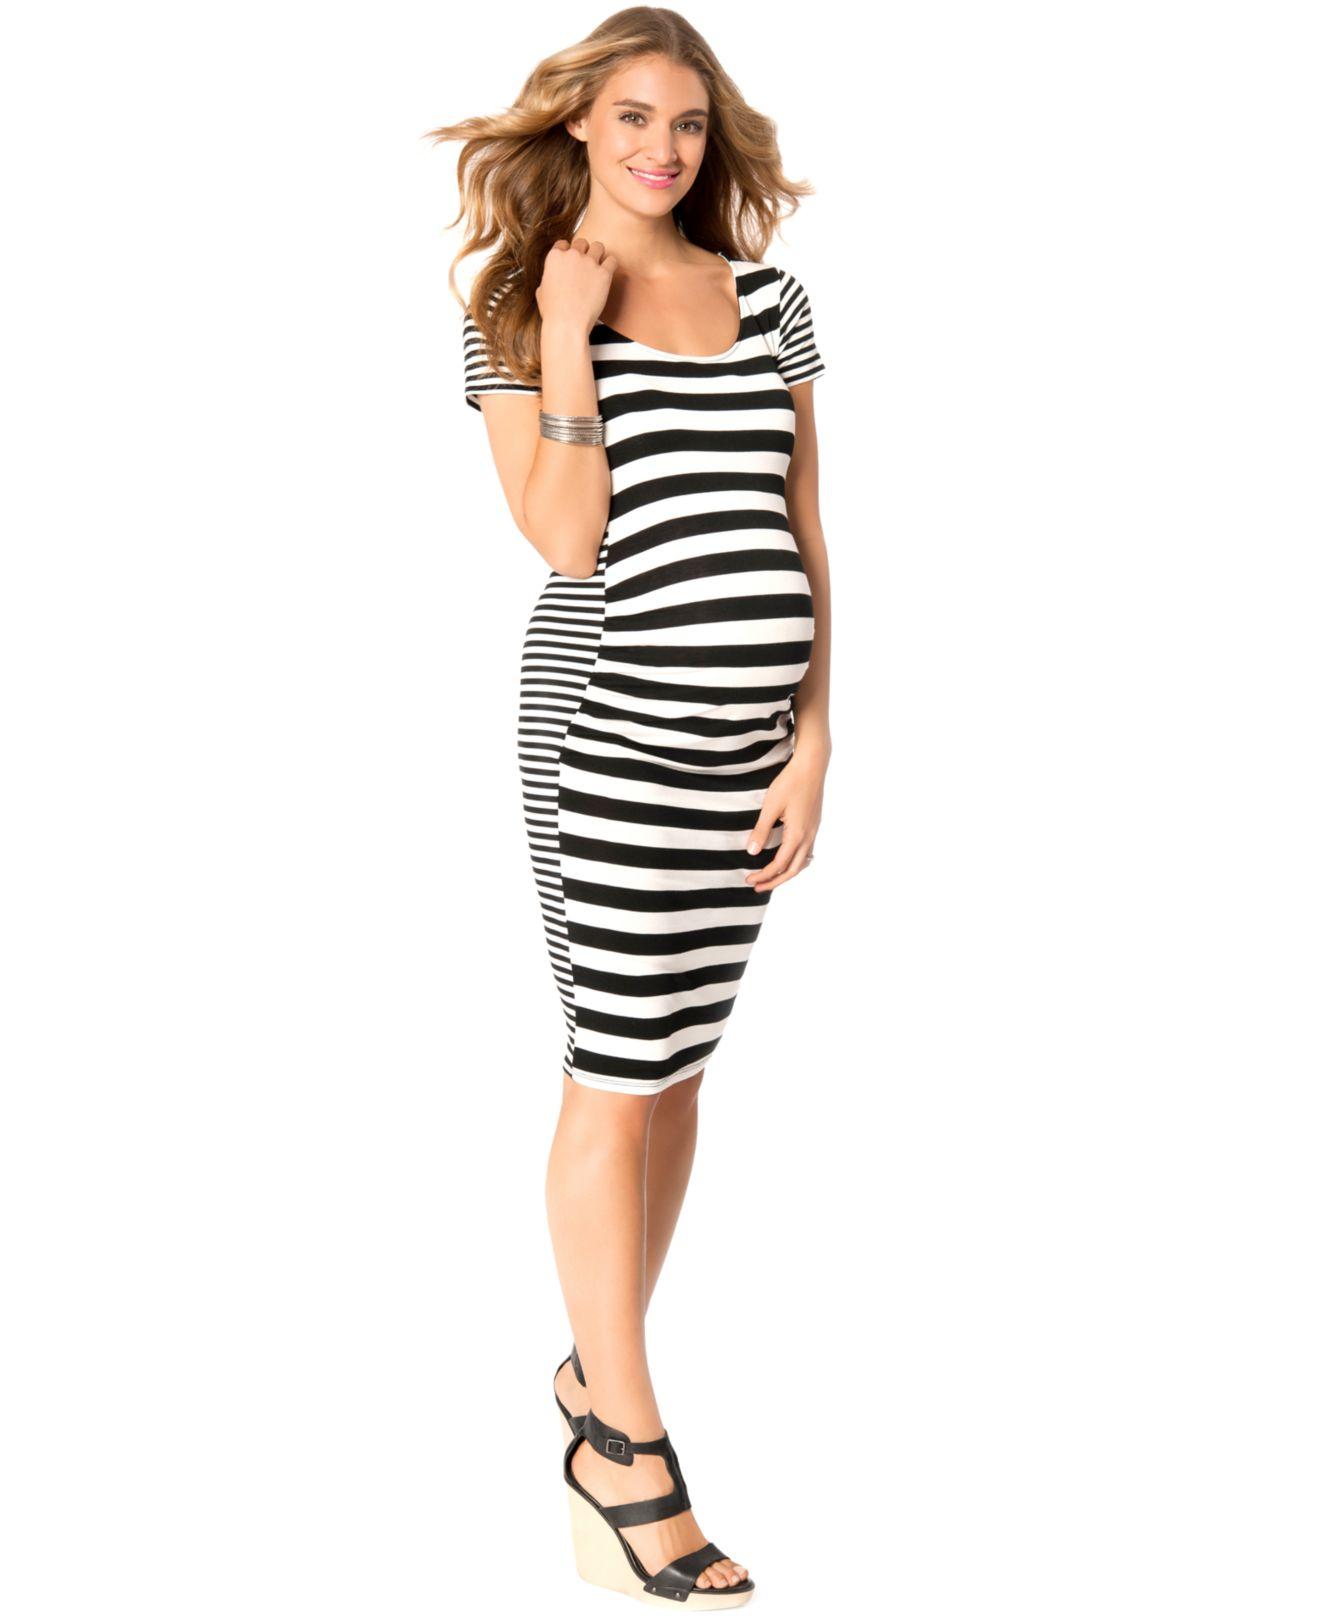 70bcfae5c773 Jessica Simpson Maternity Striped Bodycon Dress in Black - Lyst